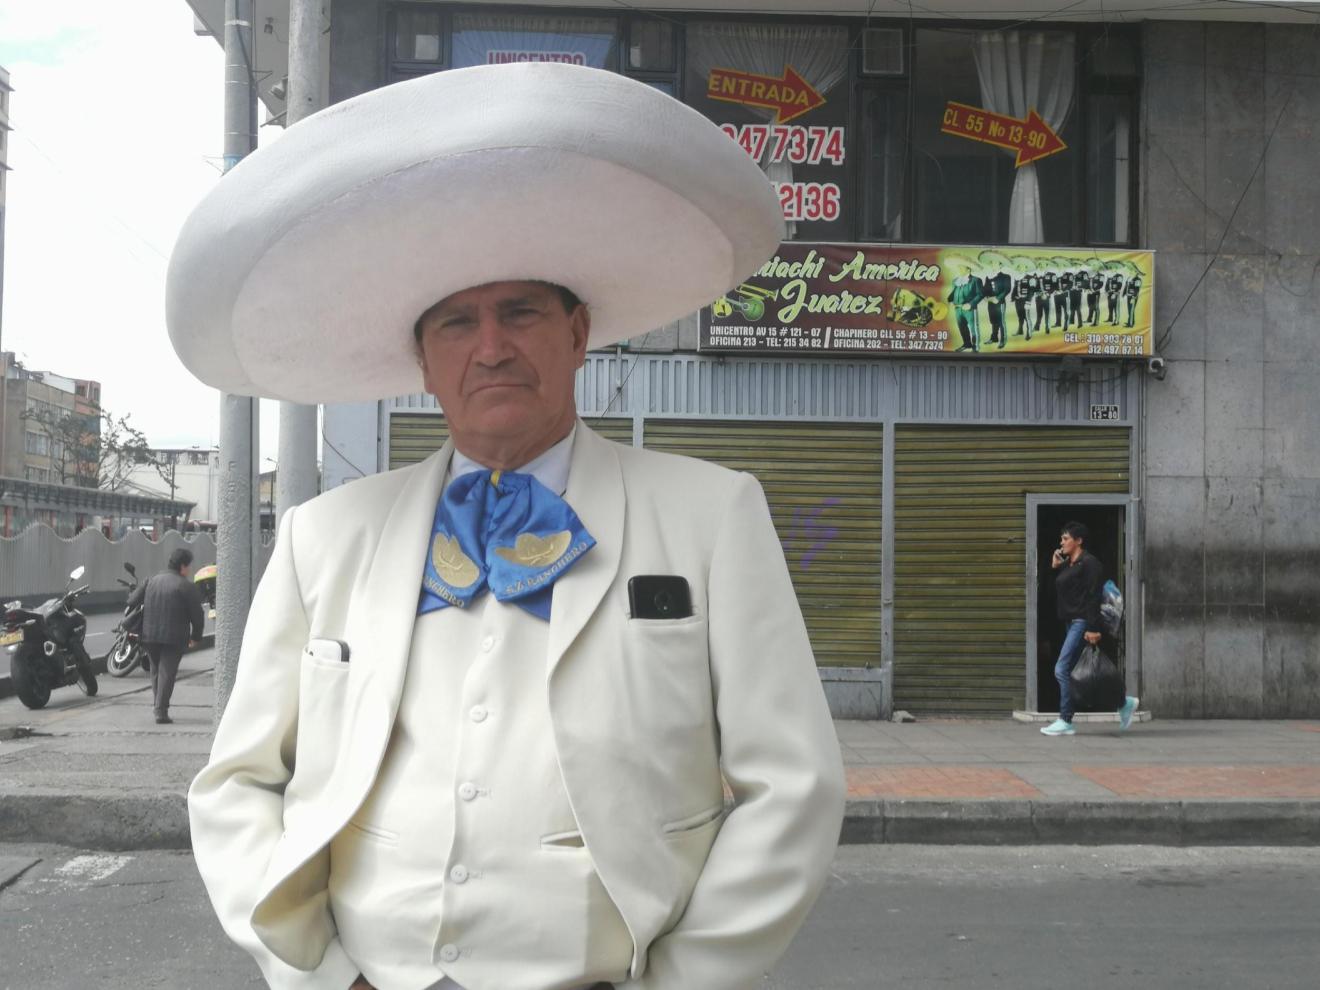 Mariachi in Bogotá